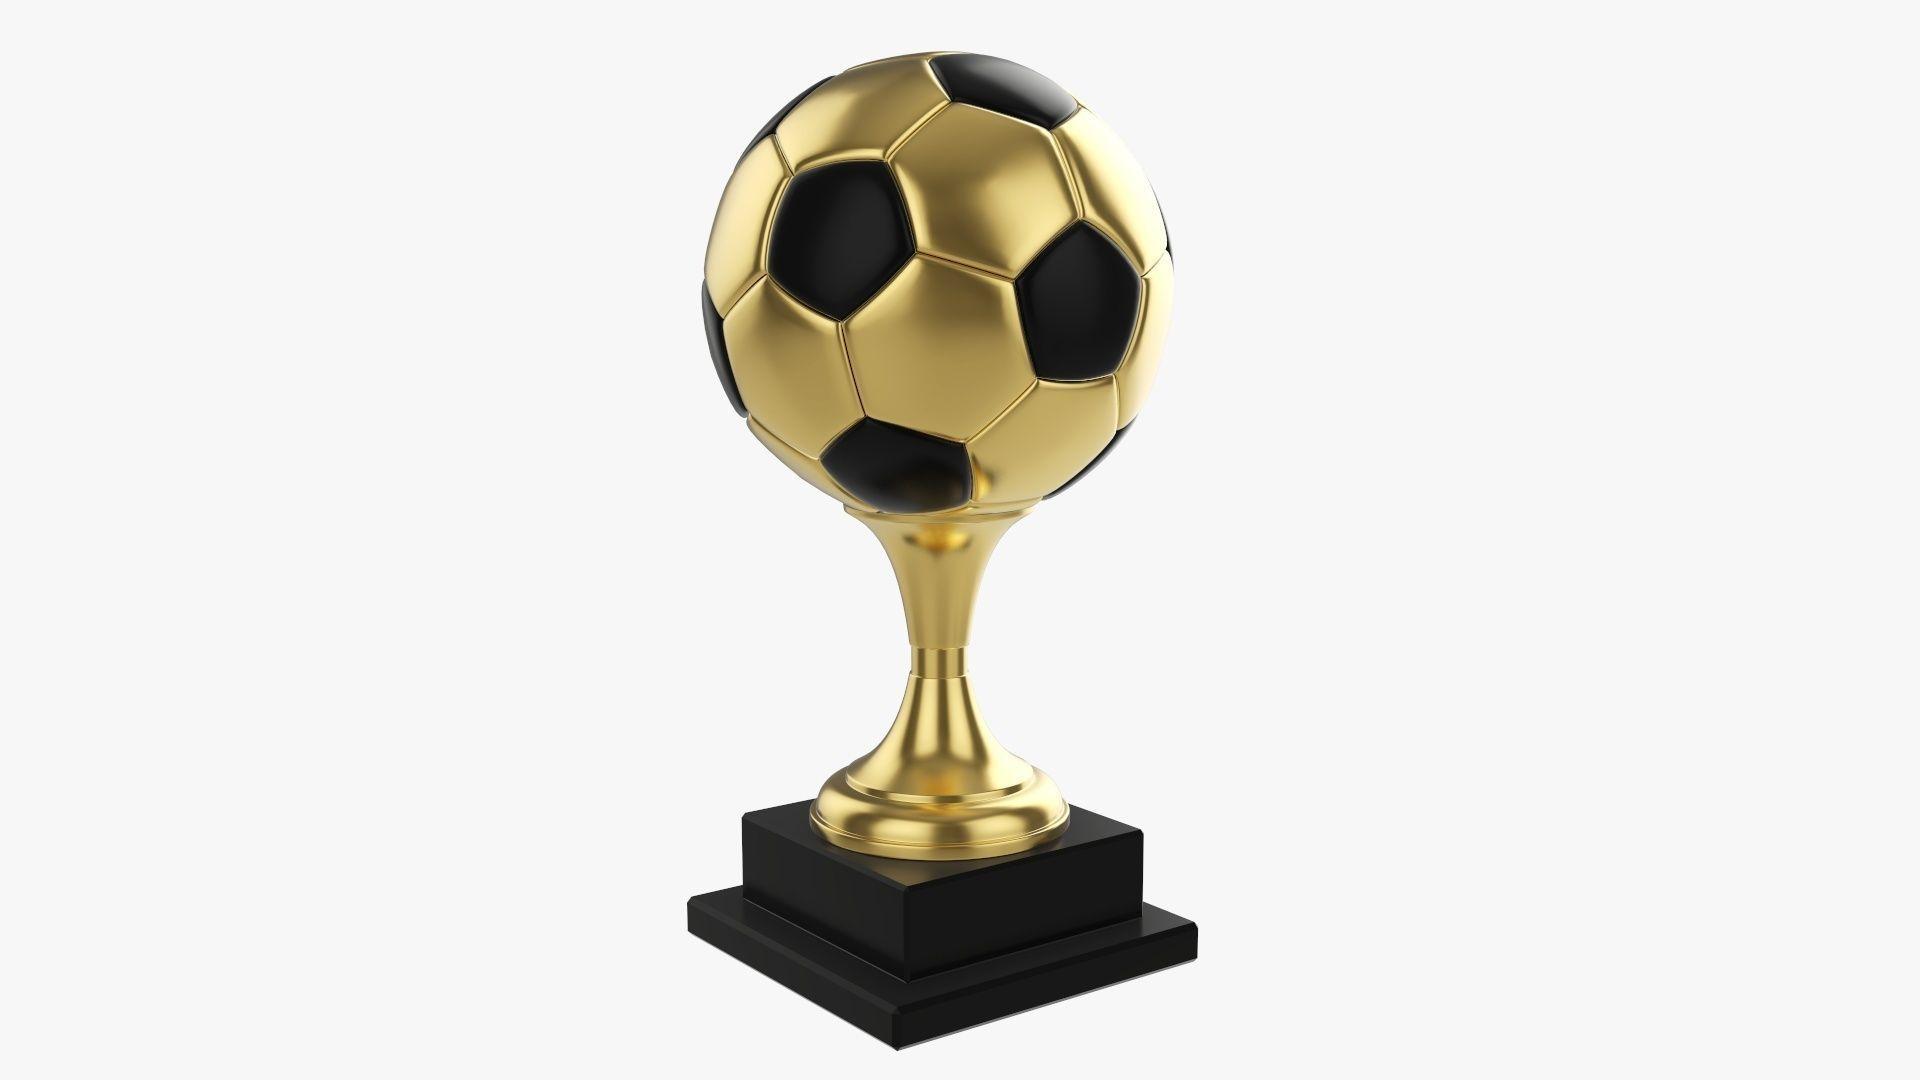 Trophy ball soccer